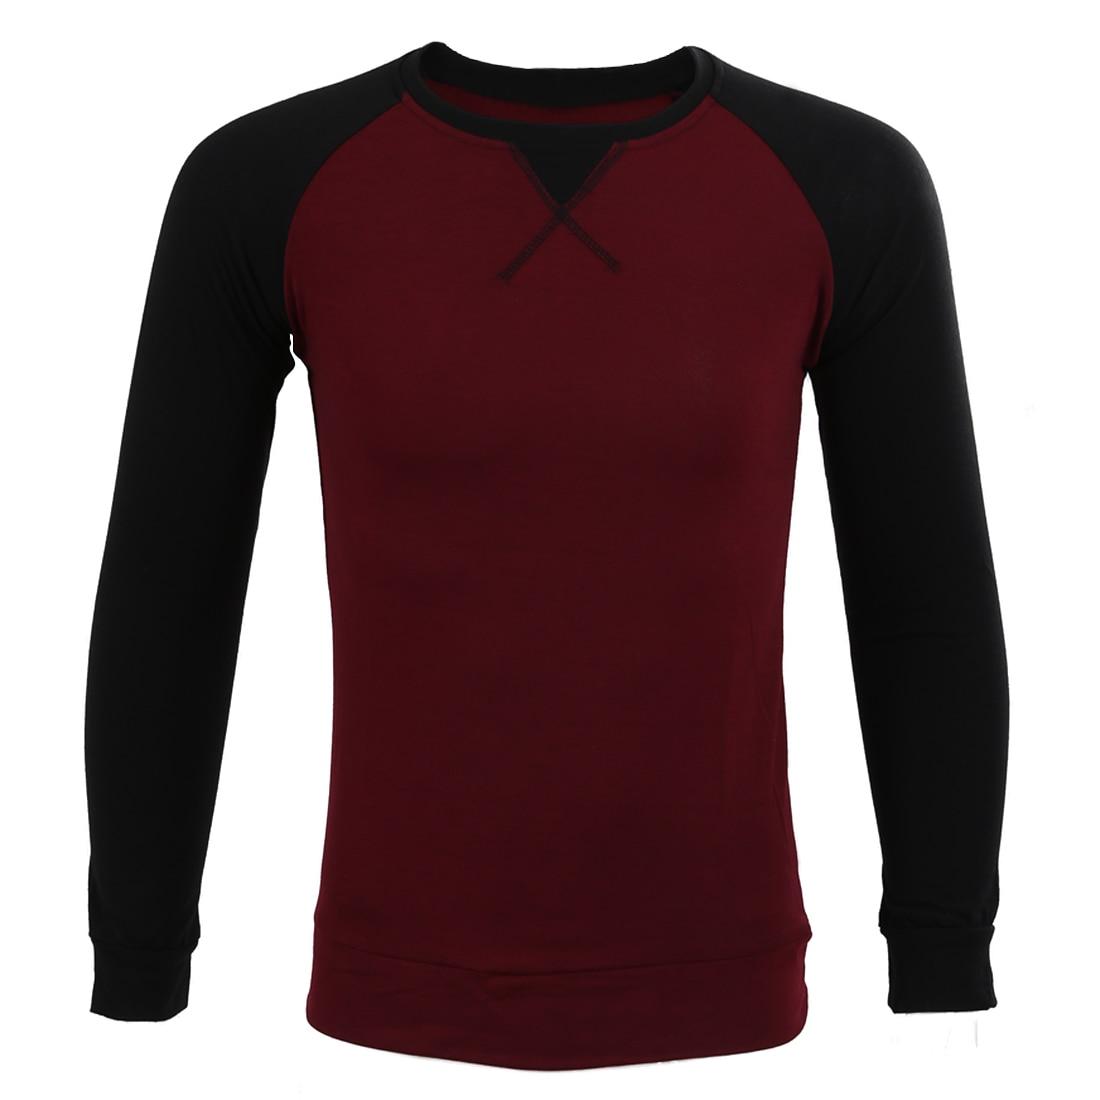 Syb 2016 fashion clothing long sleeve t shirt baseball for Long sweaters and shirts